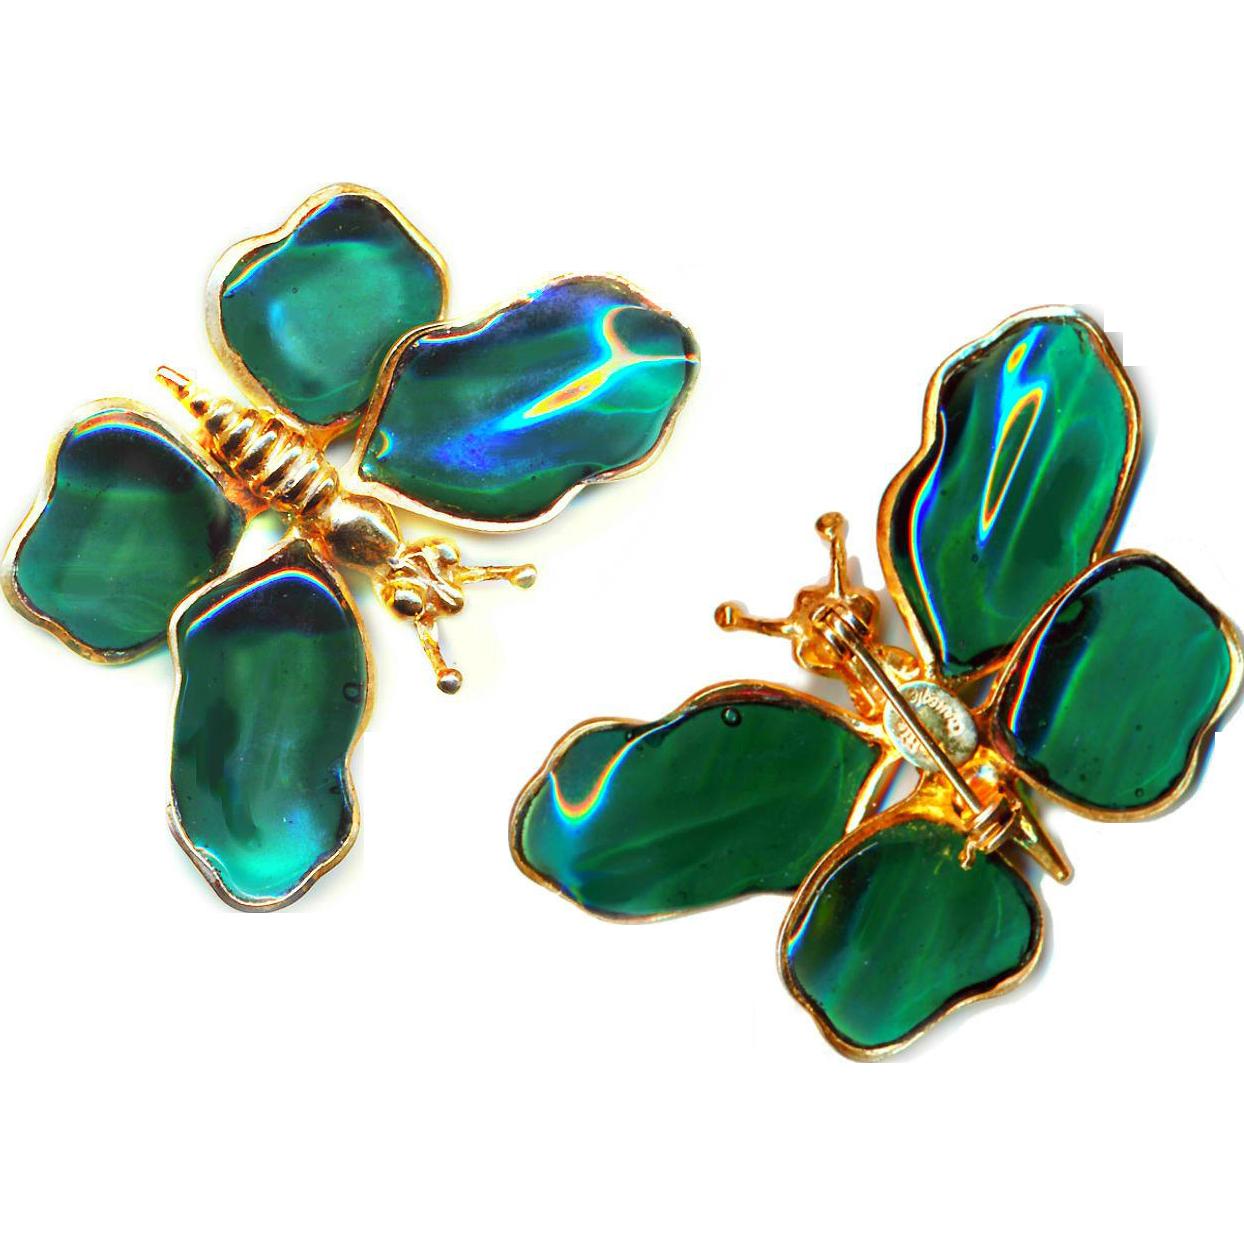 Brooch--Large Signed Hattie Carnegie Poured Glass Butterfly in Emerald Green Glass